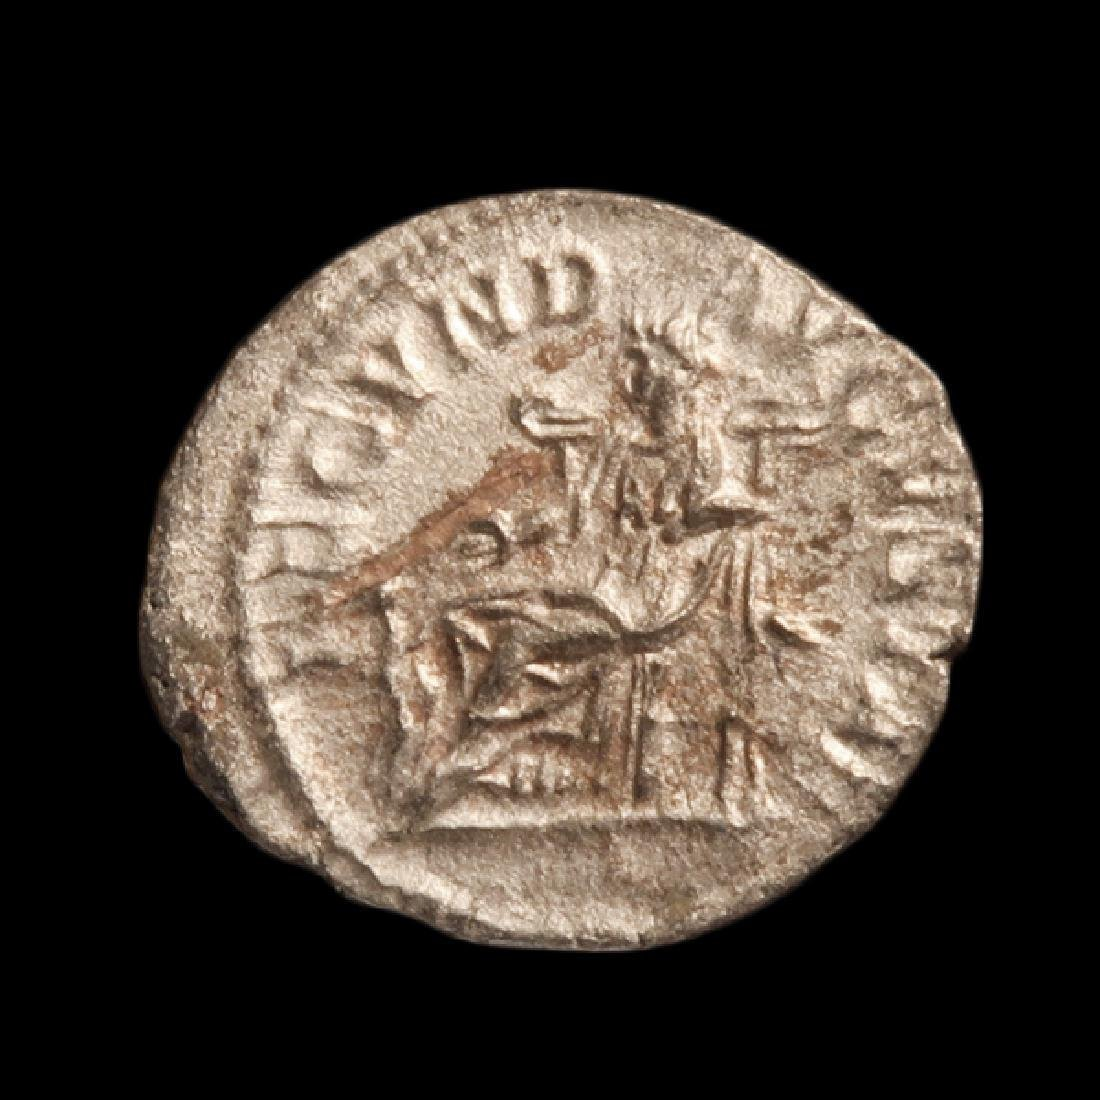 Emperess Julia Maesa SILVER DENARIUS Coin, Struck Rome - 2